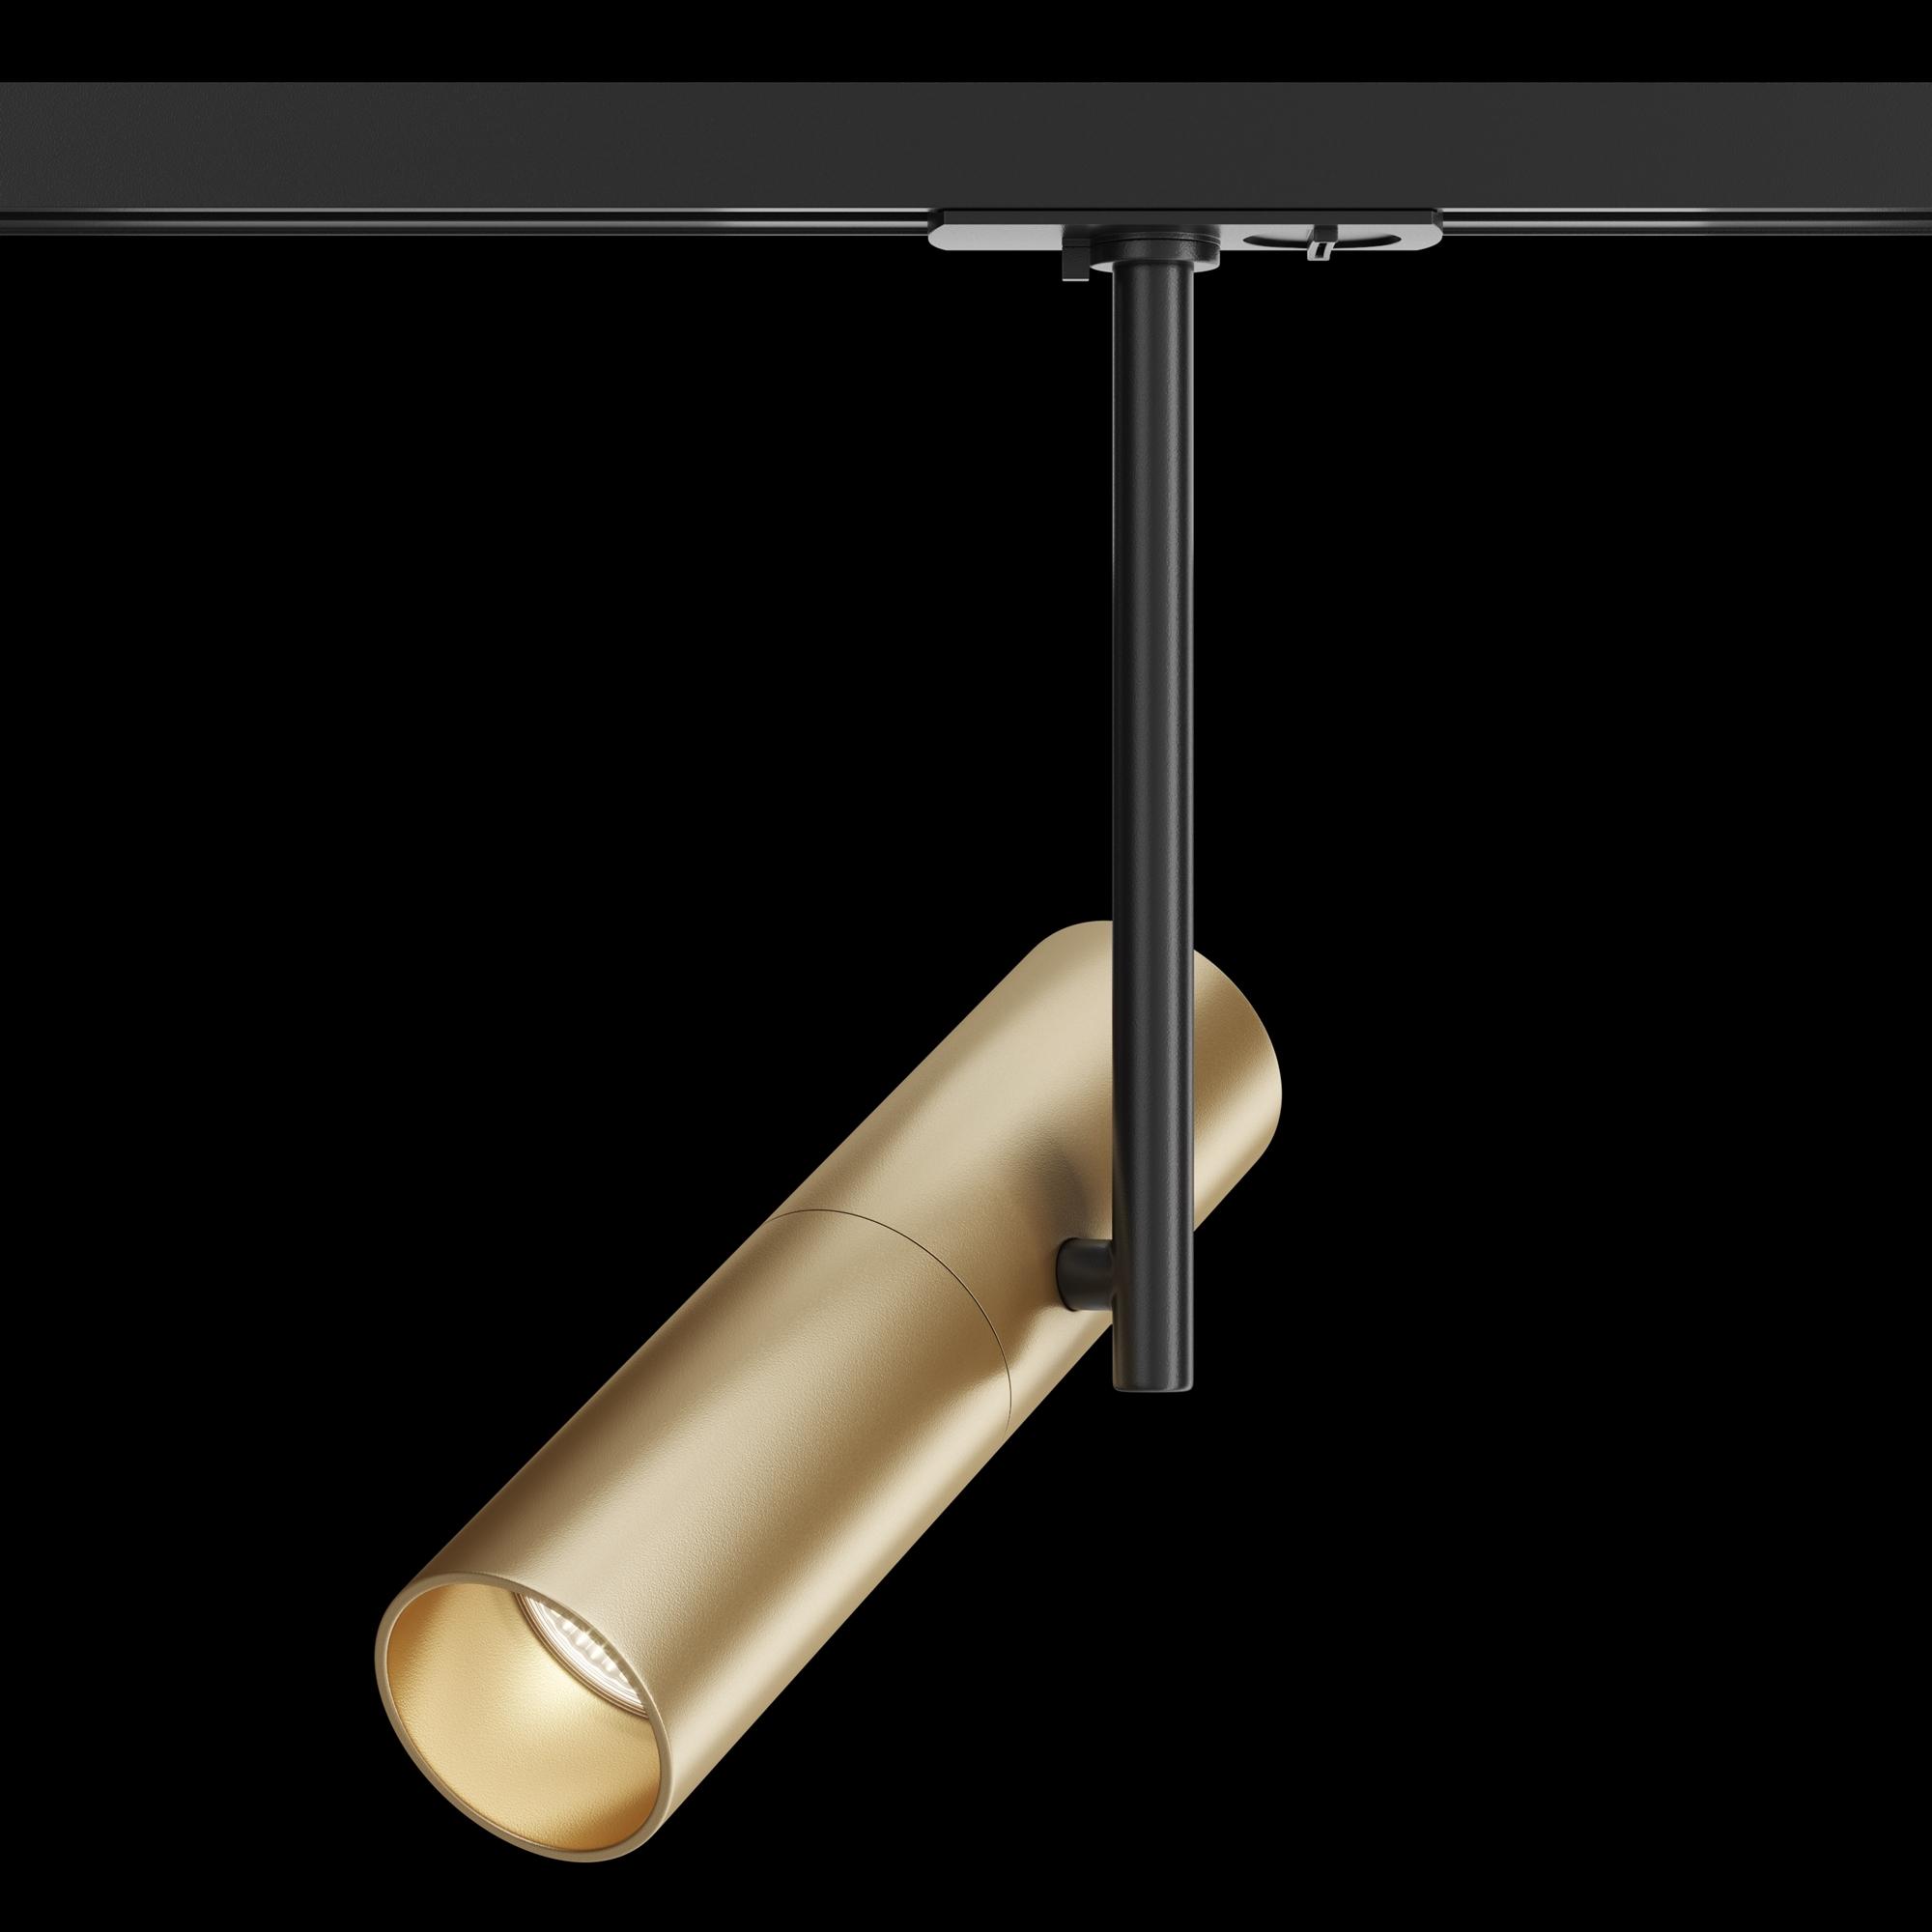 Светильник Maytoni Elti TR005-1-GU10-BG, 1xGU10x50W, черный, золото, металл - фото 2